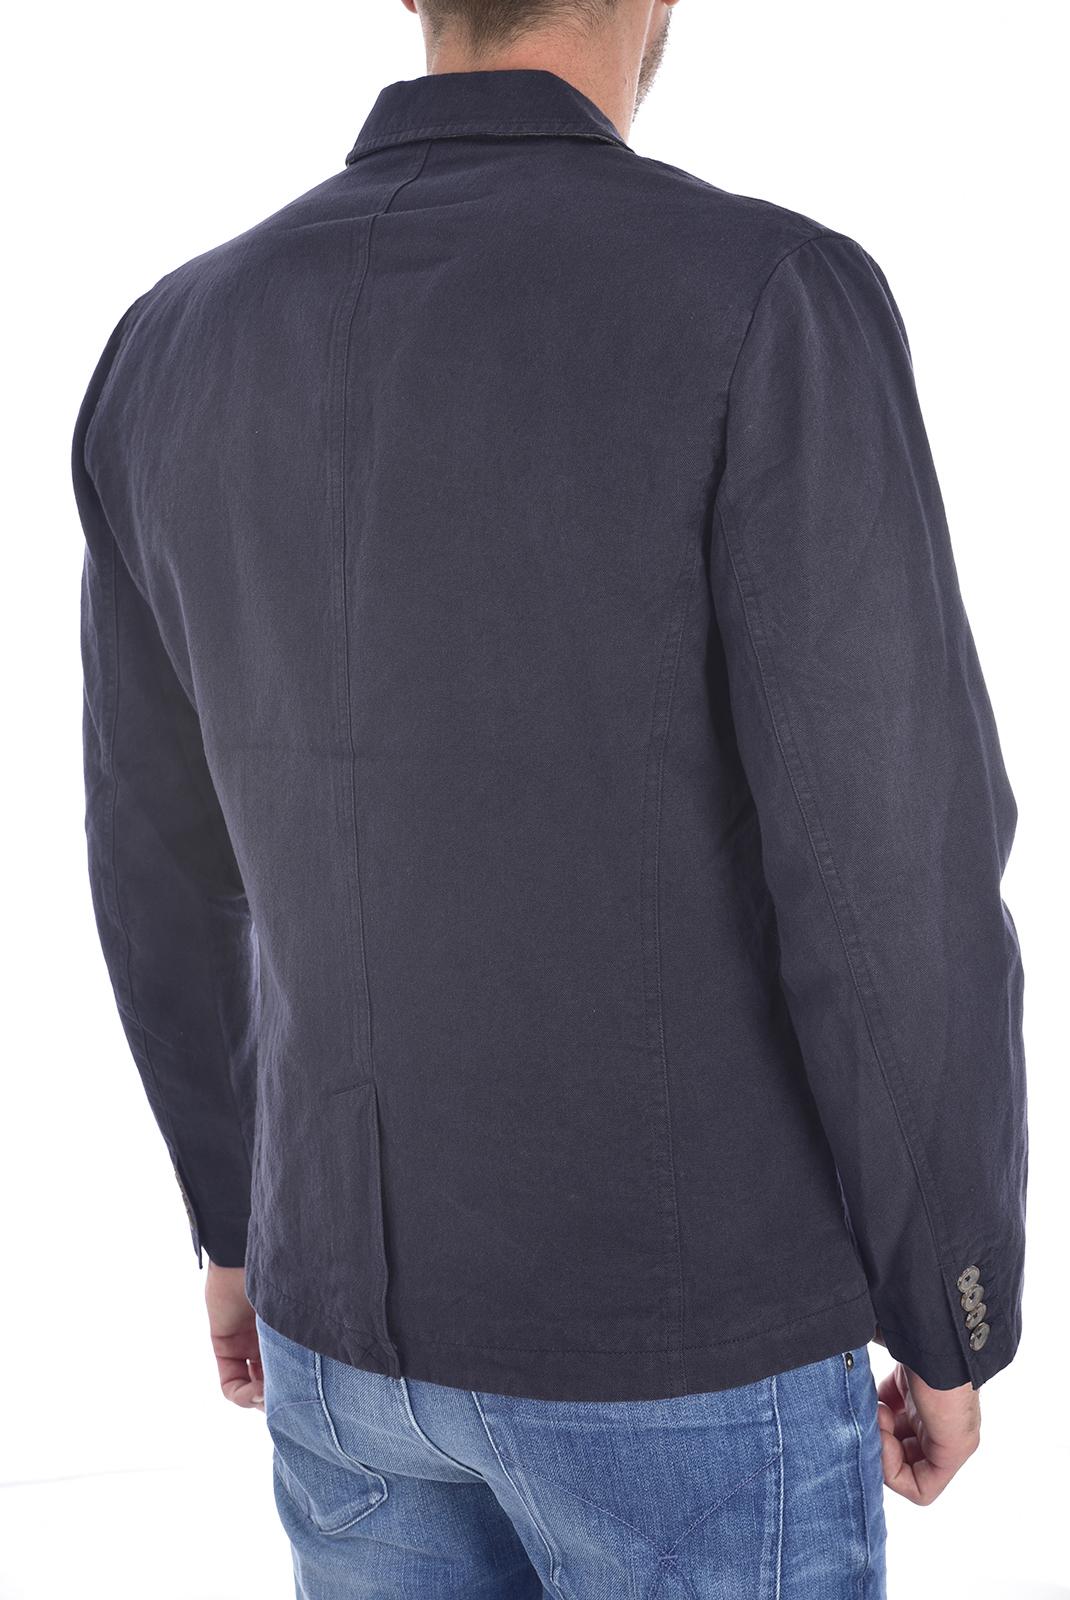 Vestes  Pepe jeans PM401245 595